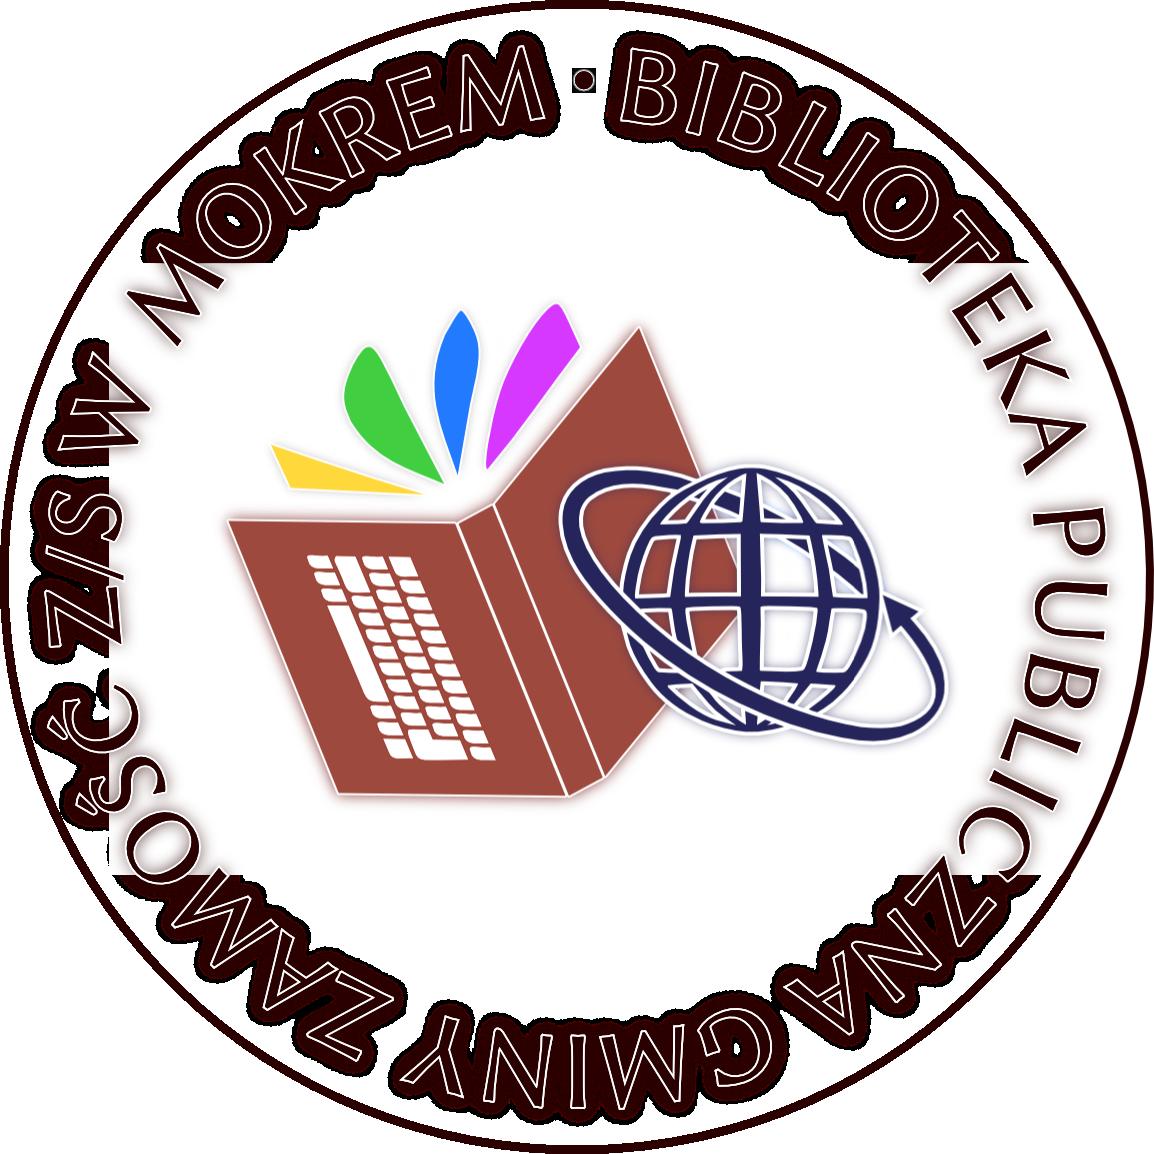 bpgz-logo-kolora-pieczec